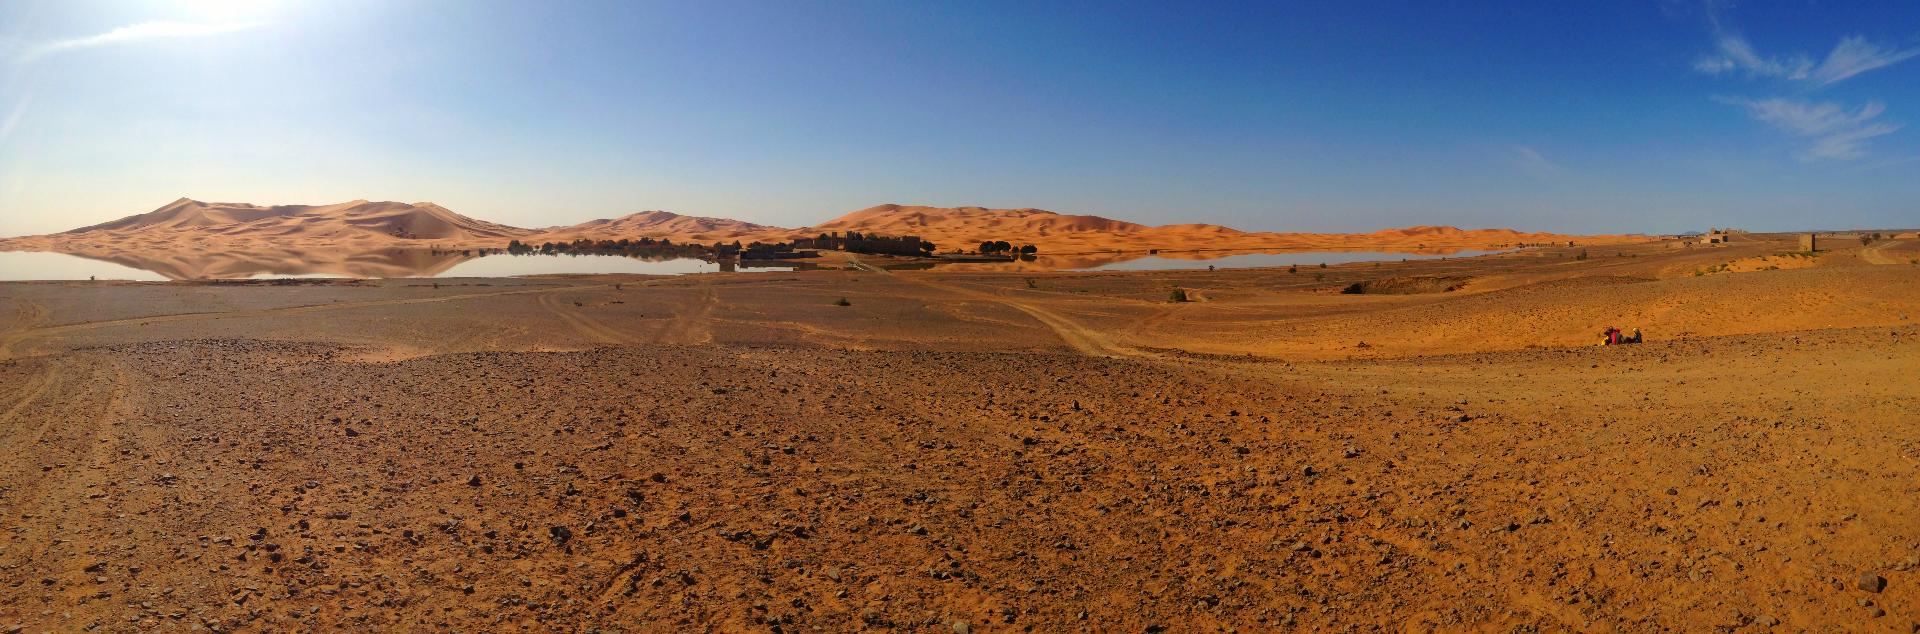 Morocco sahara Merzouga